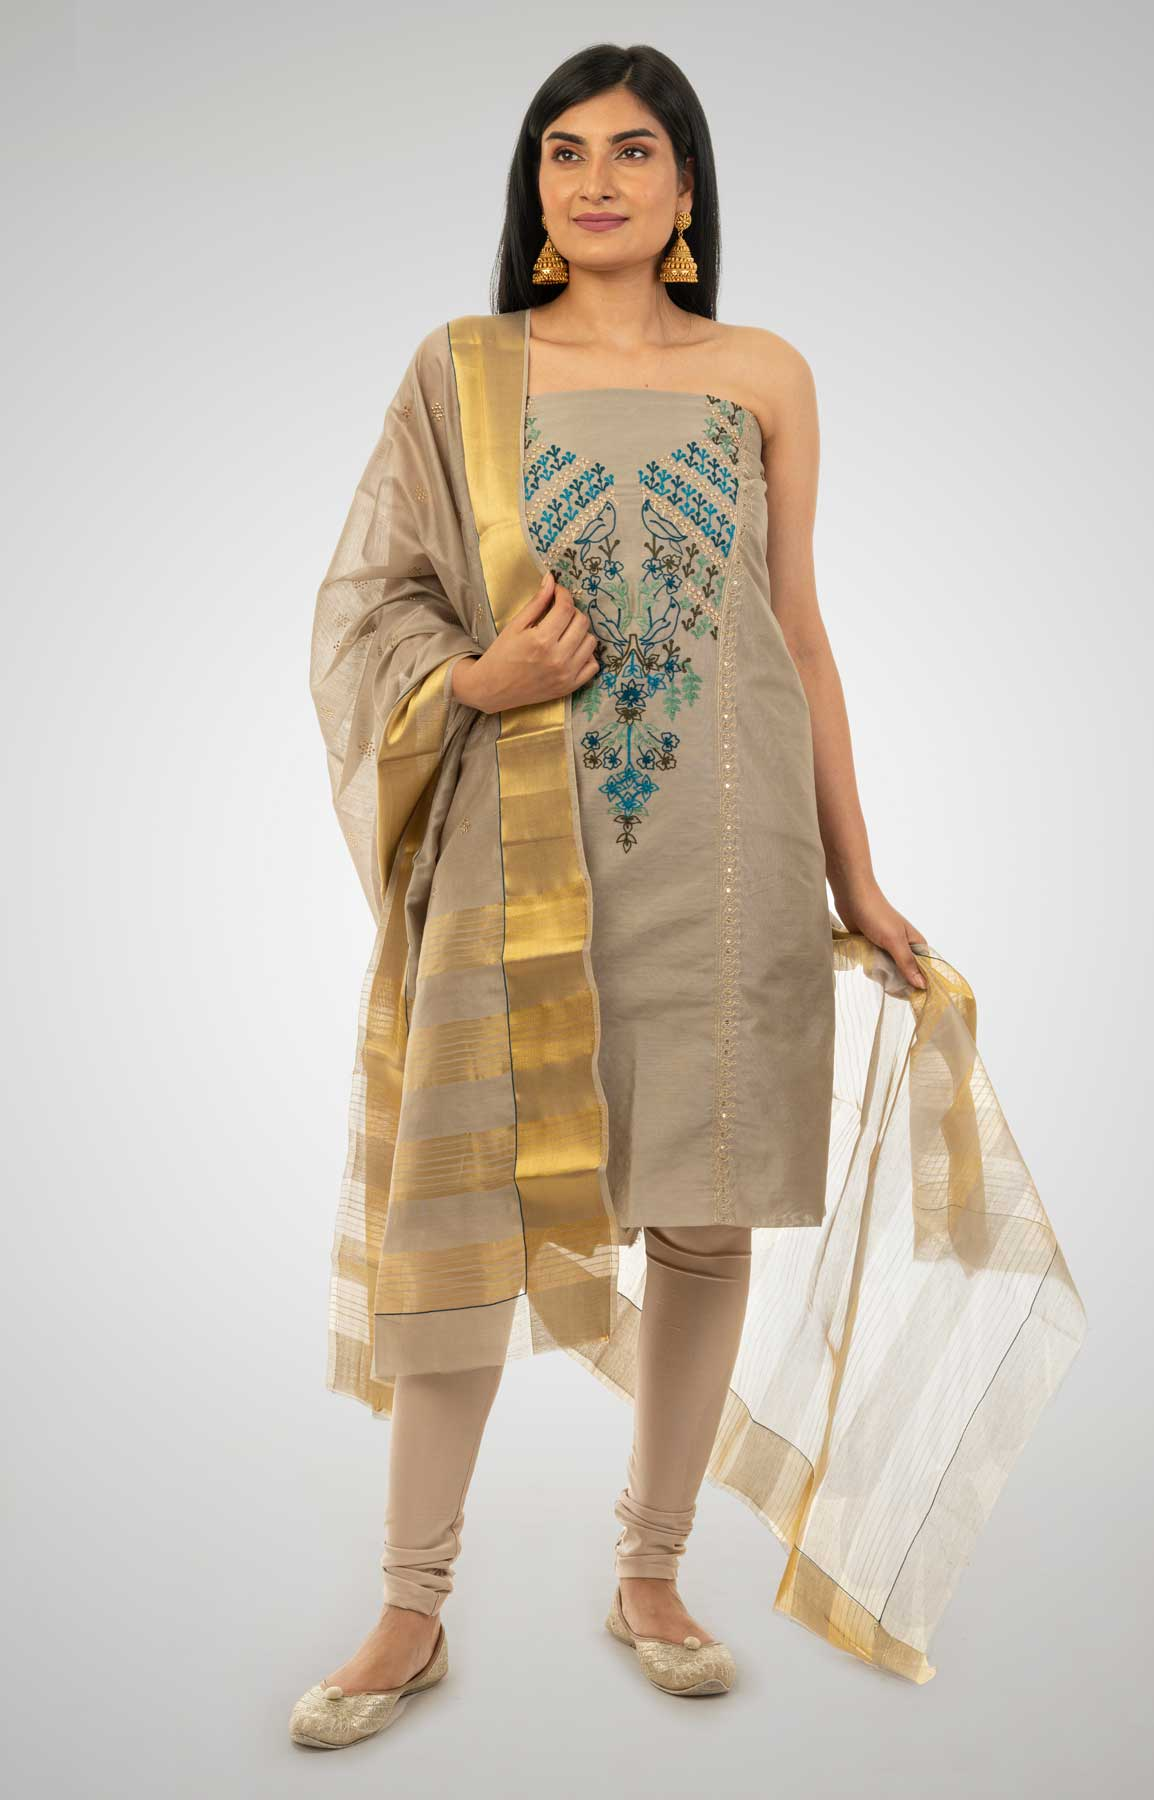 Grey Chanderi Silk Unstitched Suit Fabric With Resham And Zari Aari Work – Viraaya By Ushnakmals